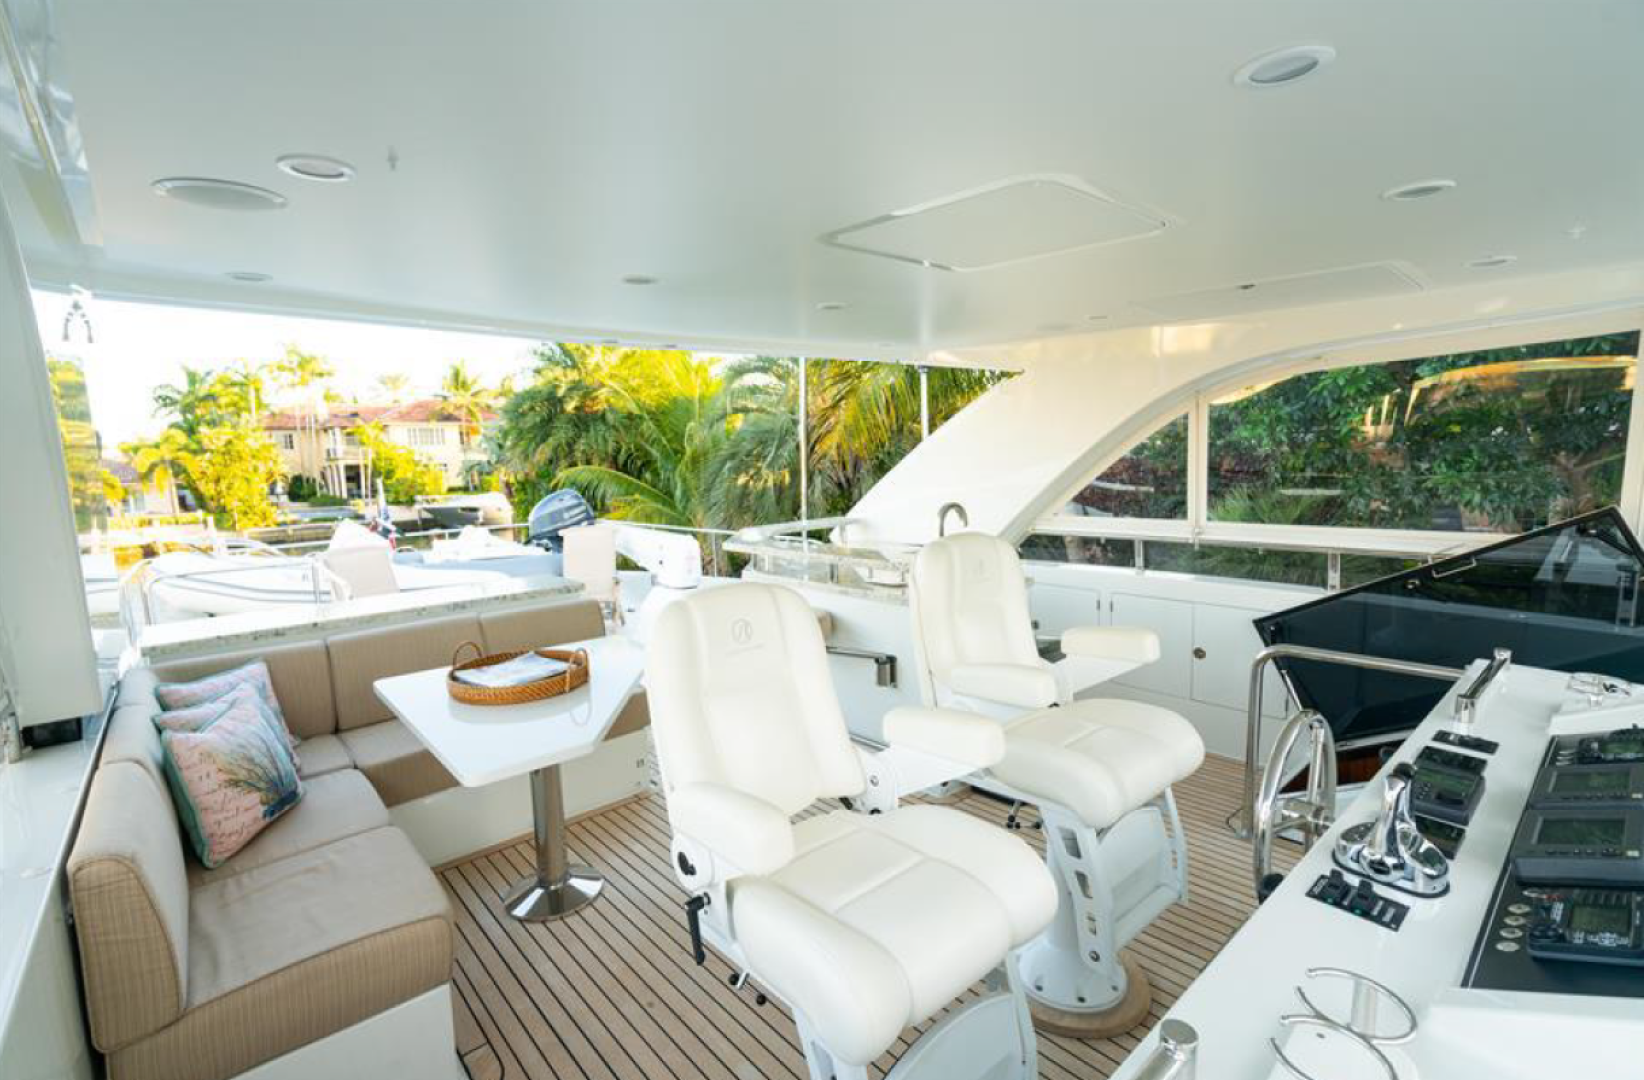 Ocean Alexander-Motor yacht flybridge 2016-Journey Fort Lauderdale-Florida-United States-1451189 | Thumbnail